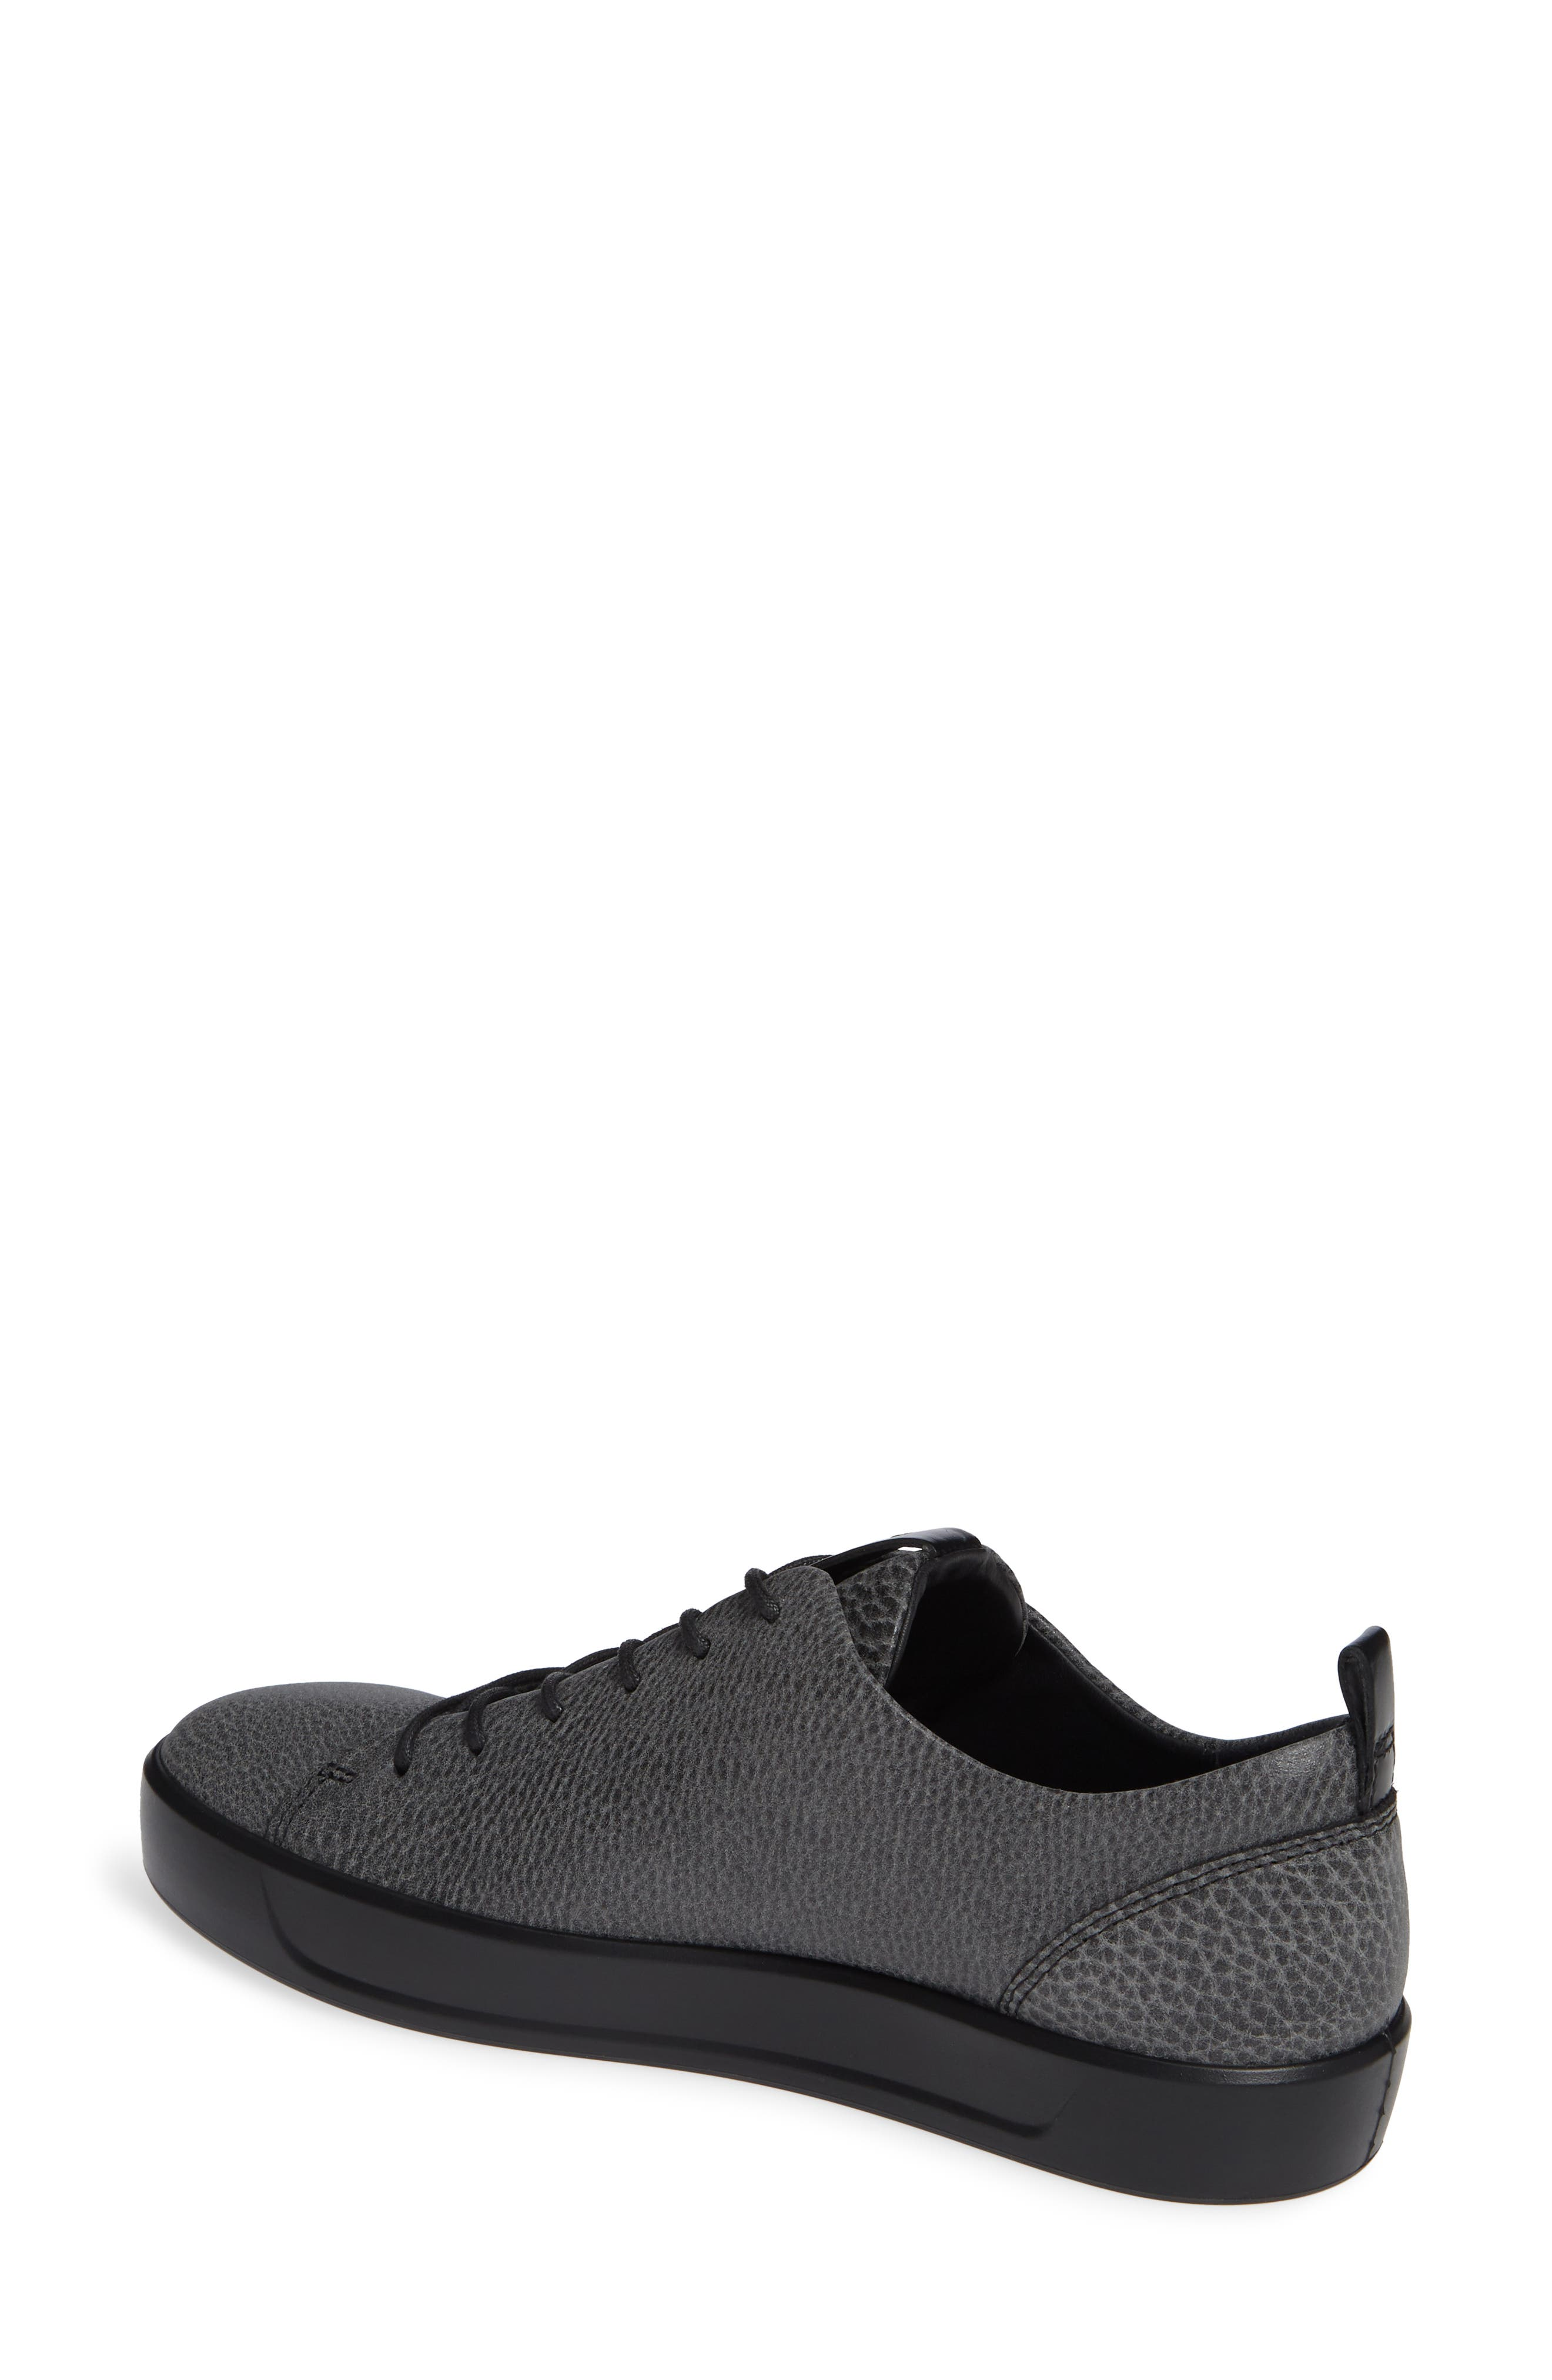 Soft 8 Sneaker,                             Alternate thumbnail 2, color,                             BLACK/ BLACK LEATHER